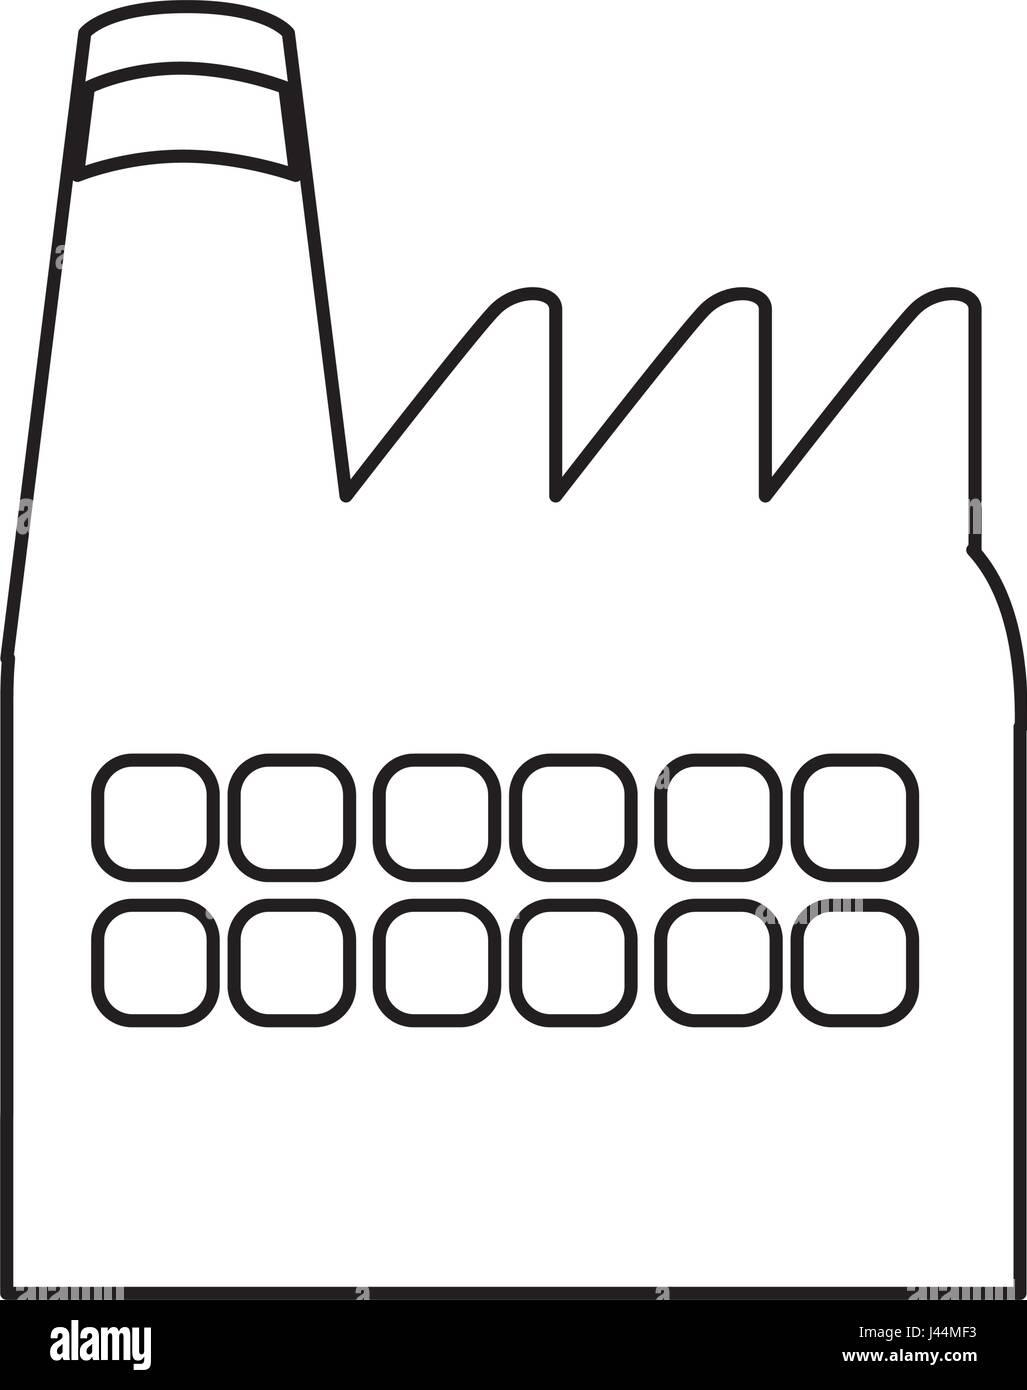 Factory building symbol stock vector art illustration vector factory building symbol biocorpaavc